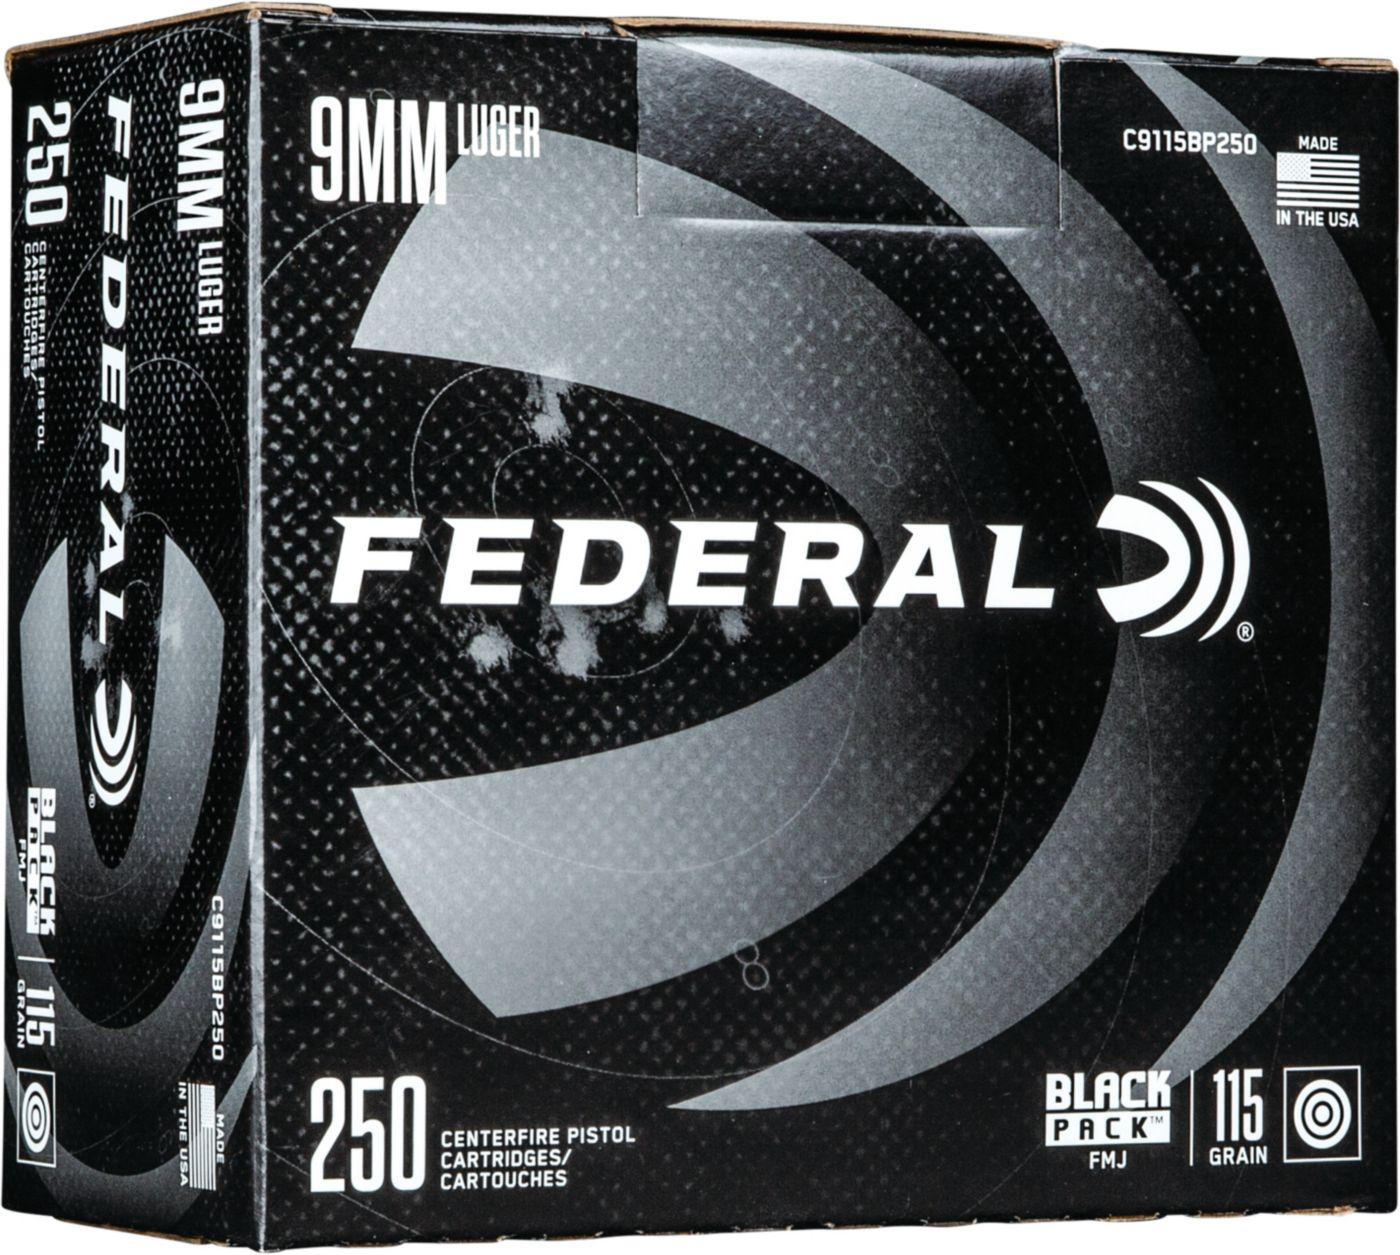 Federal Black Pack FMJ Handgun Ammo